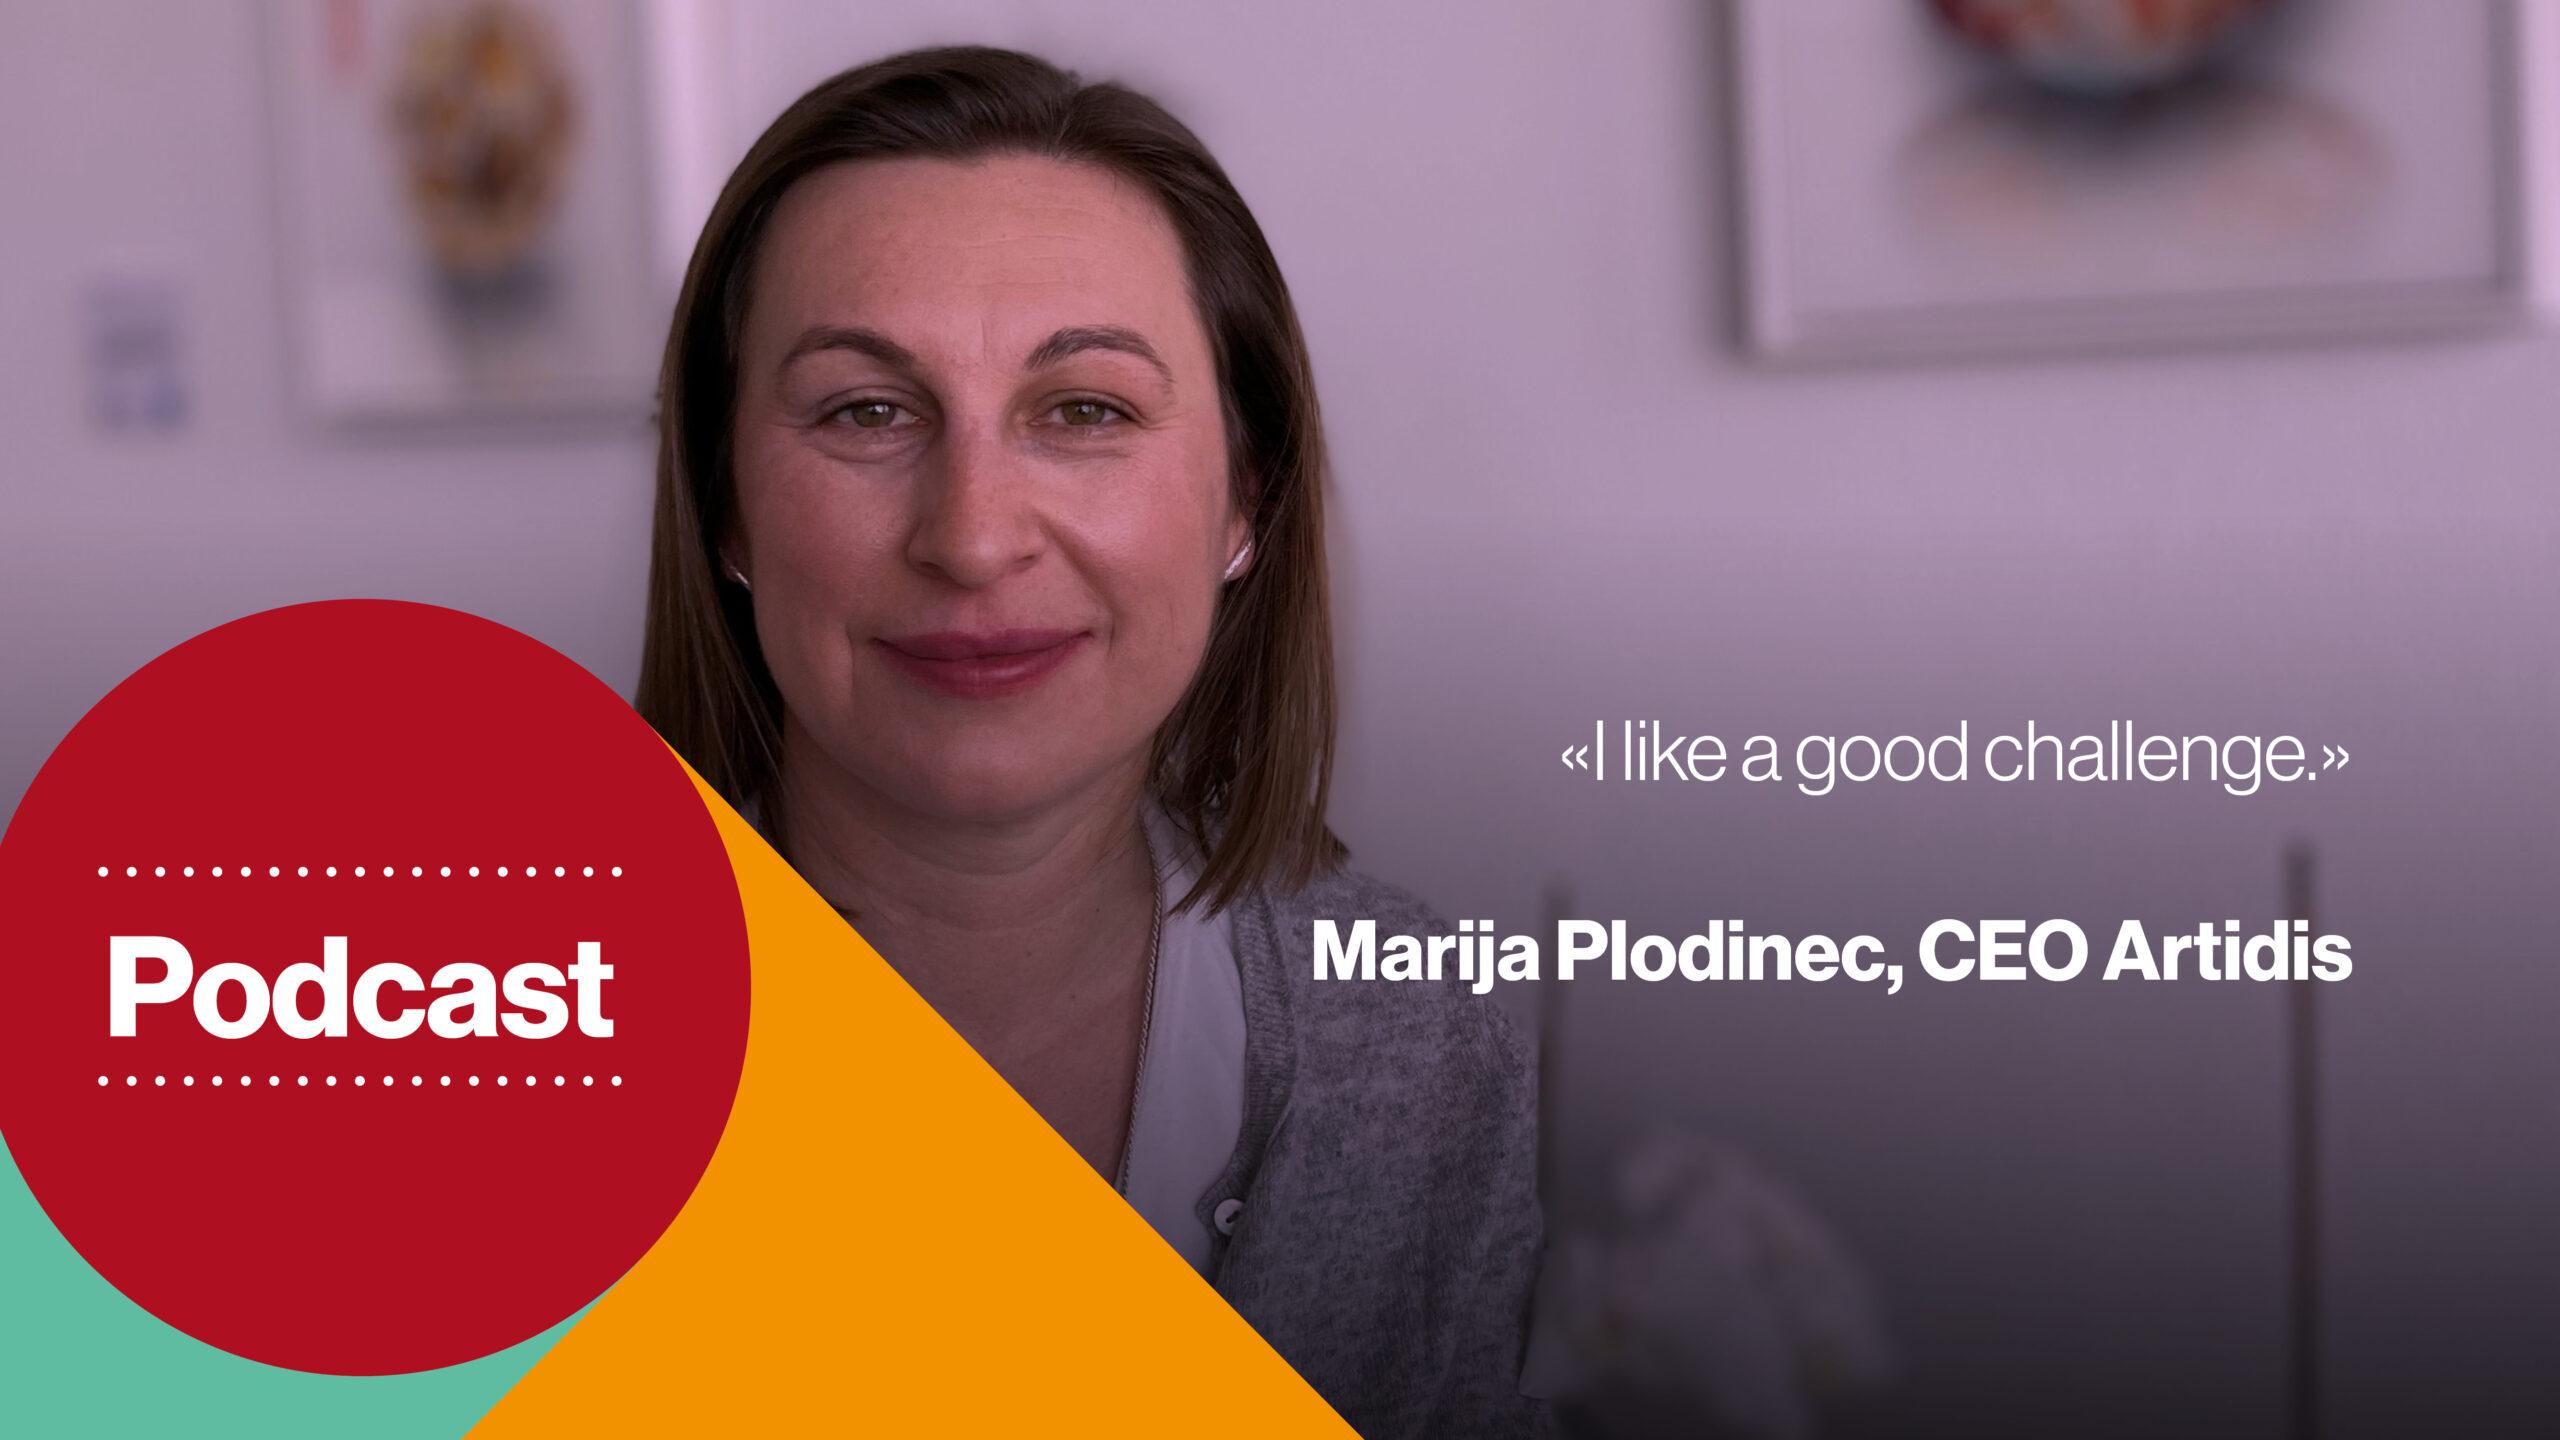 Podcast cover - Marija Plodinec, CEO Artidis, a medtech startup